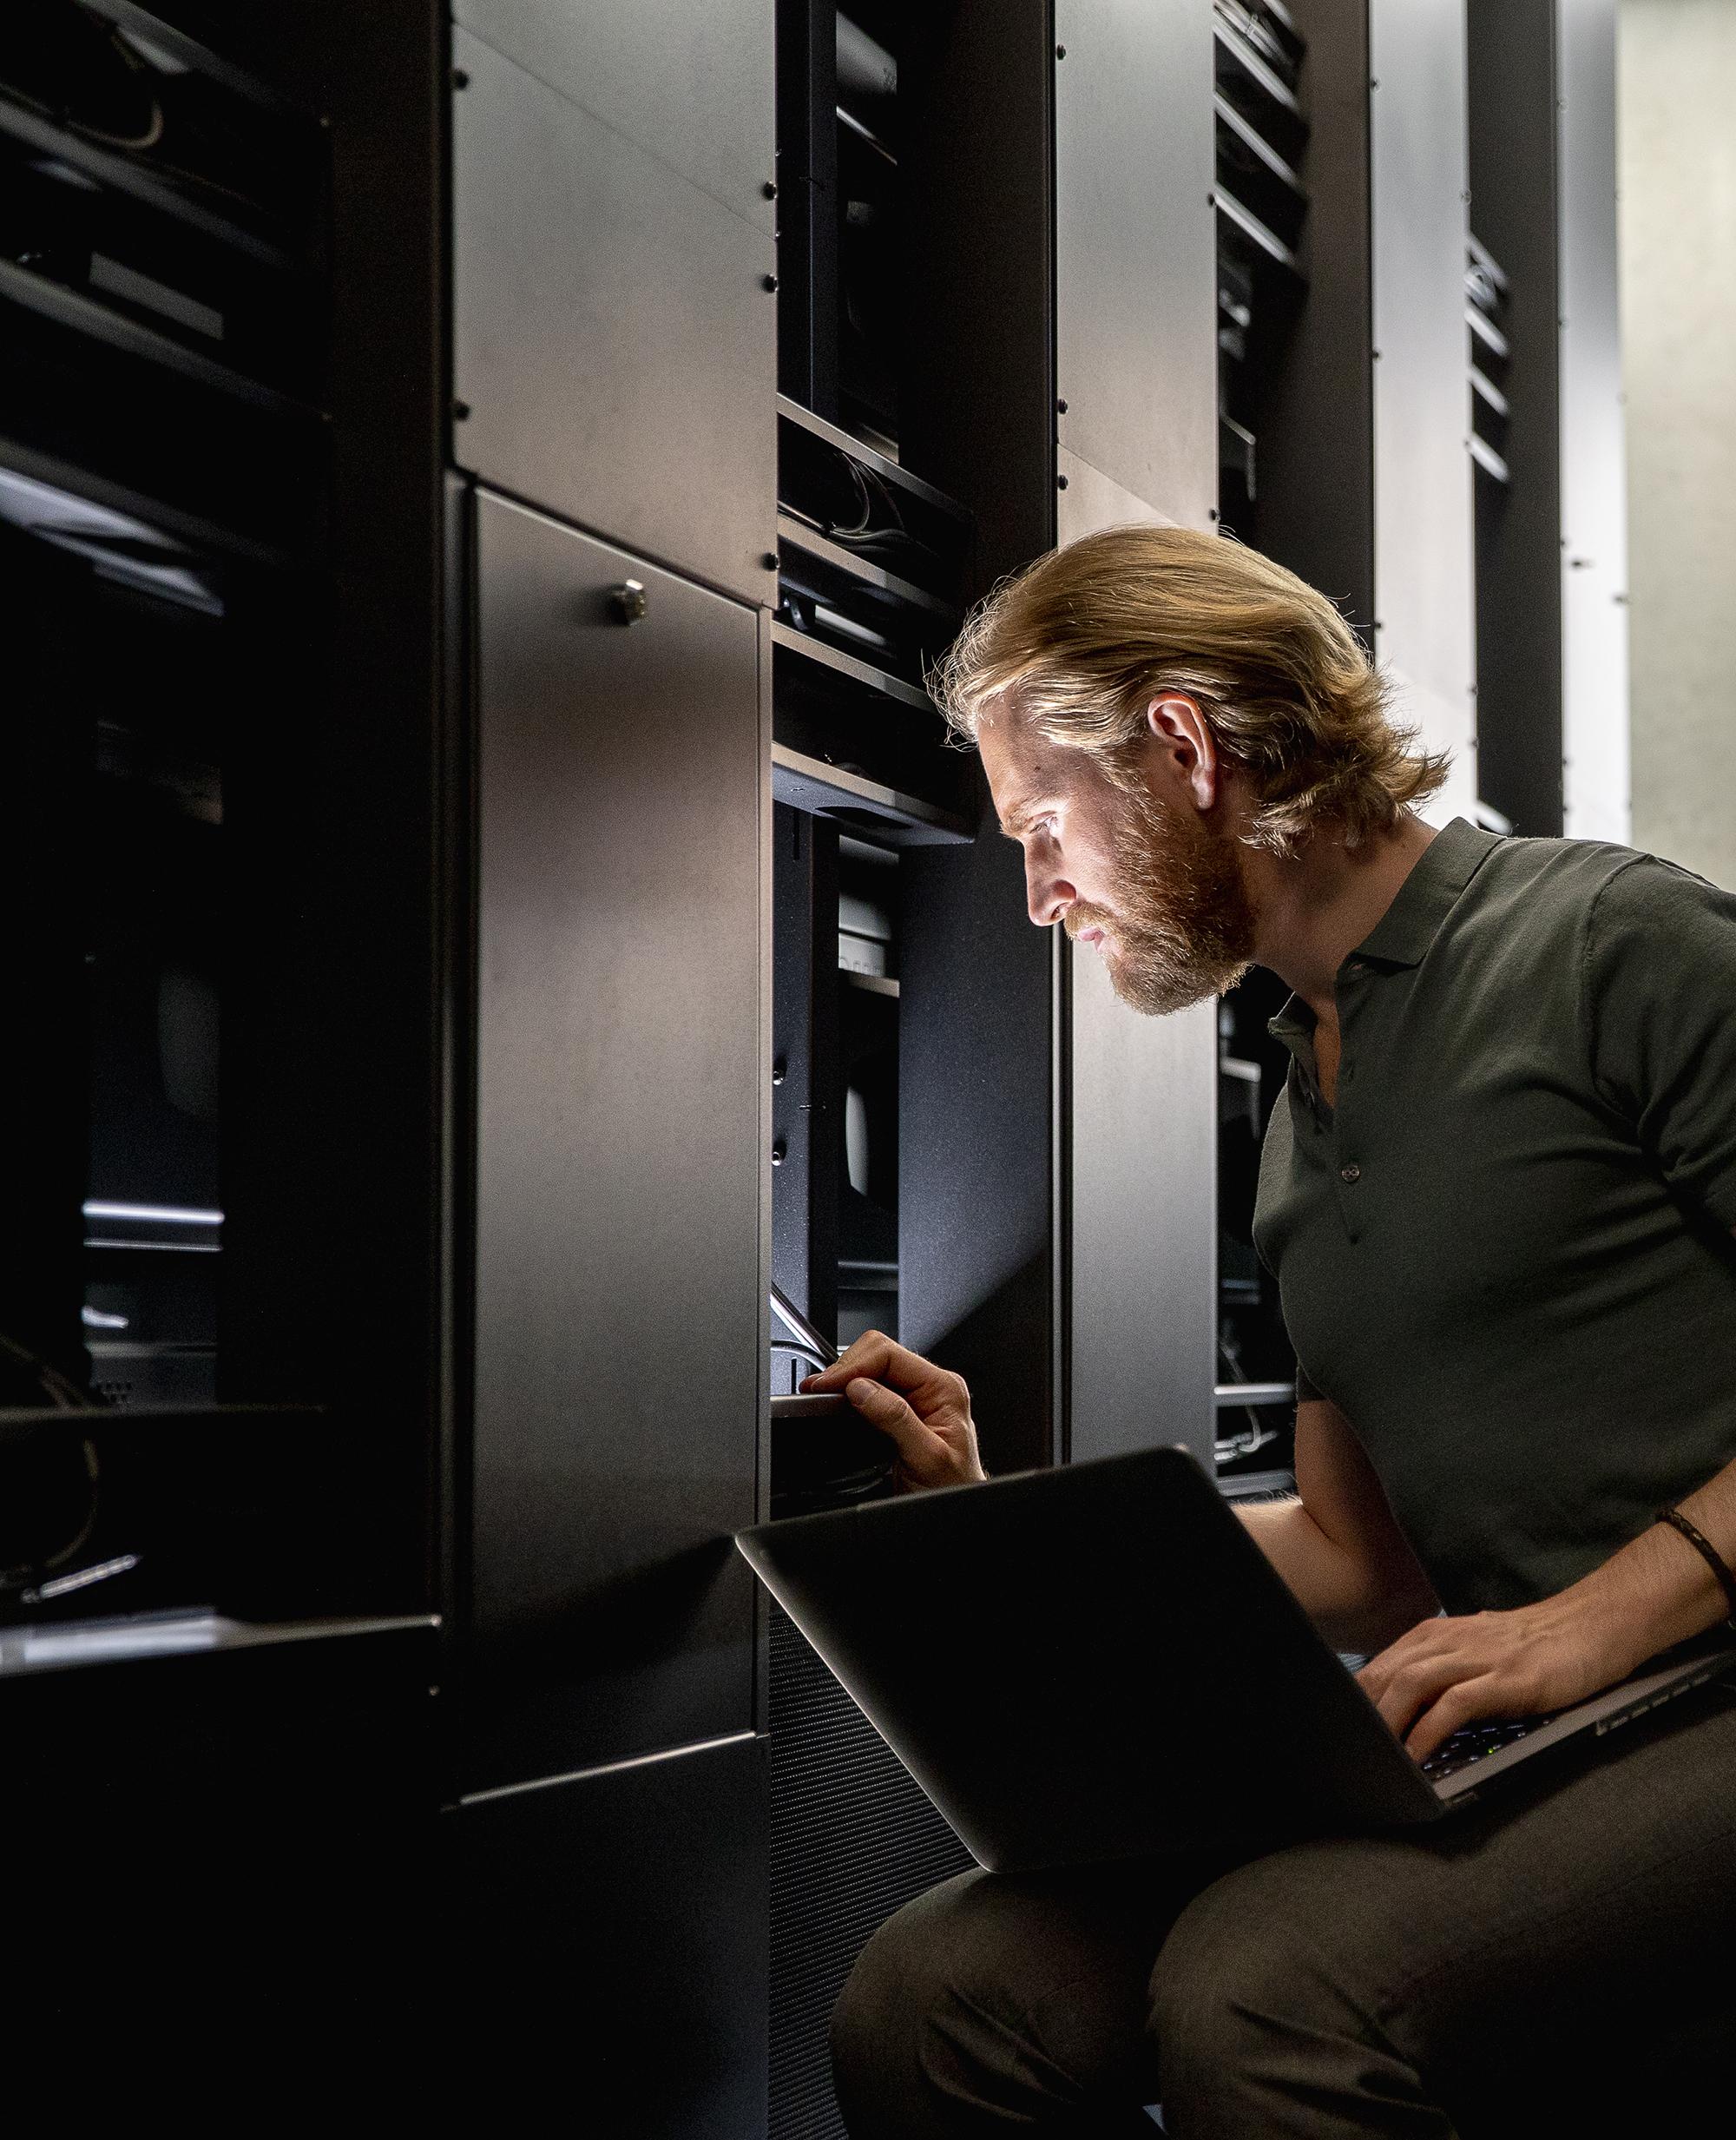 Computer Server Technician at Work